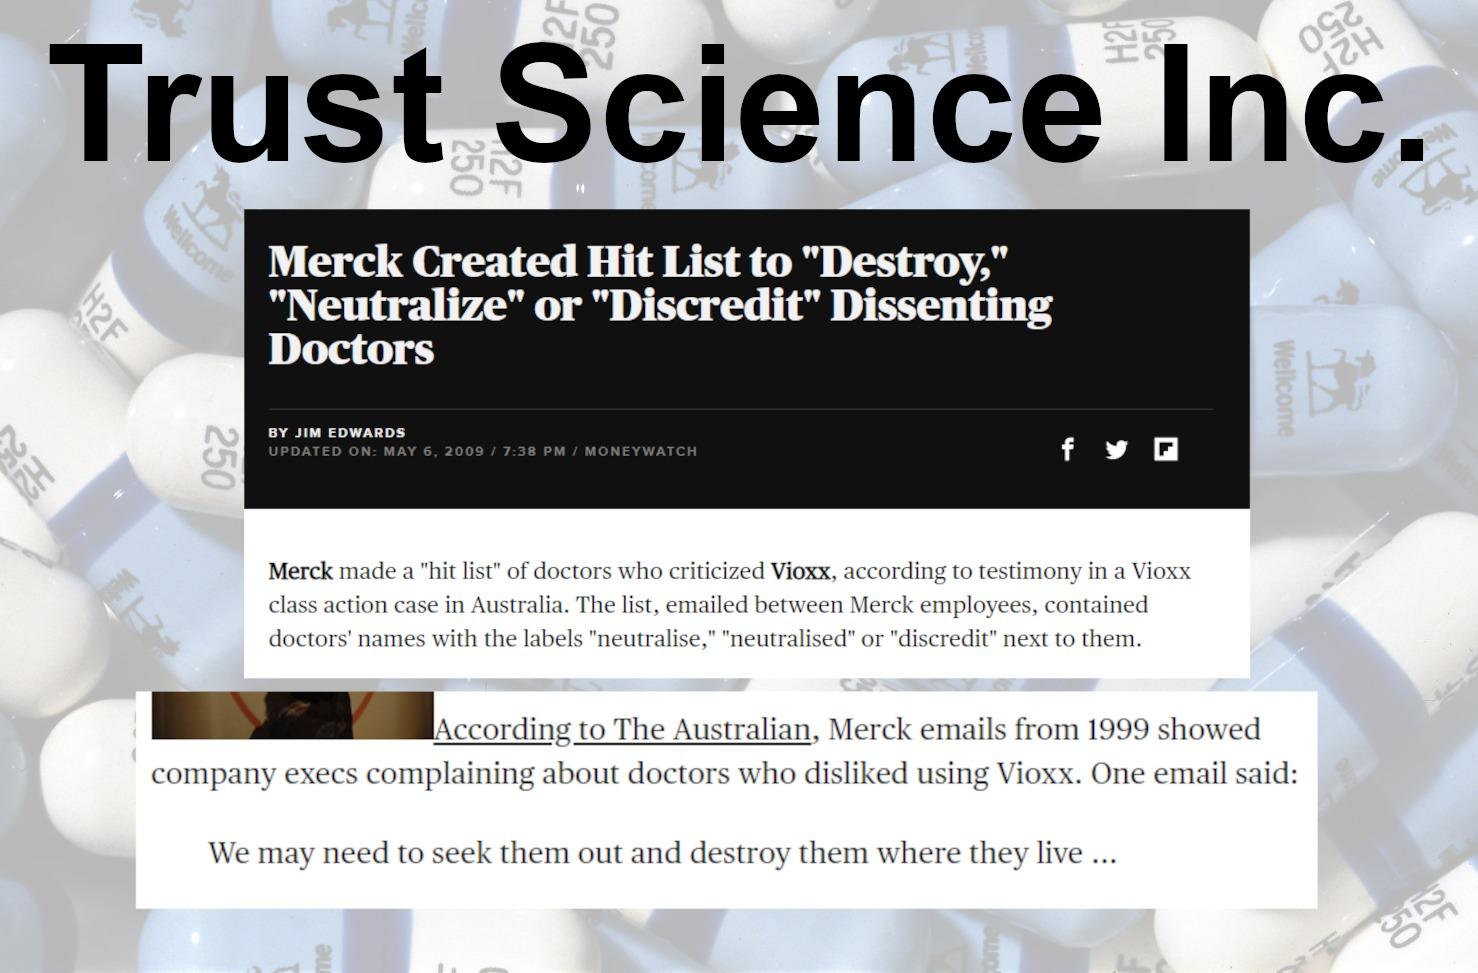 trust science, inc image